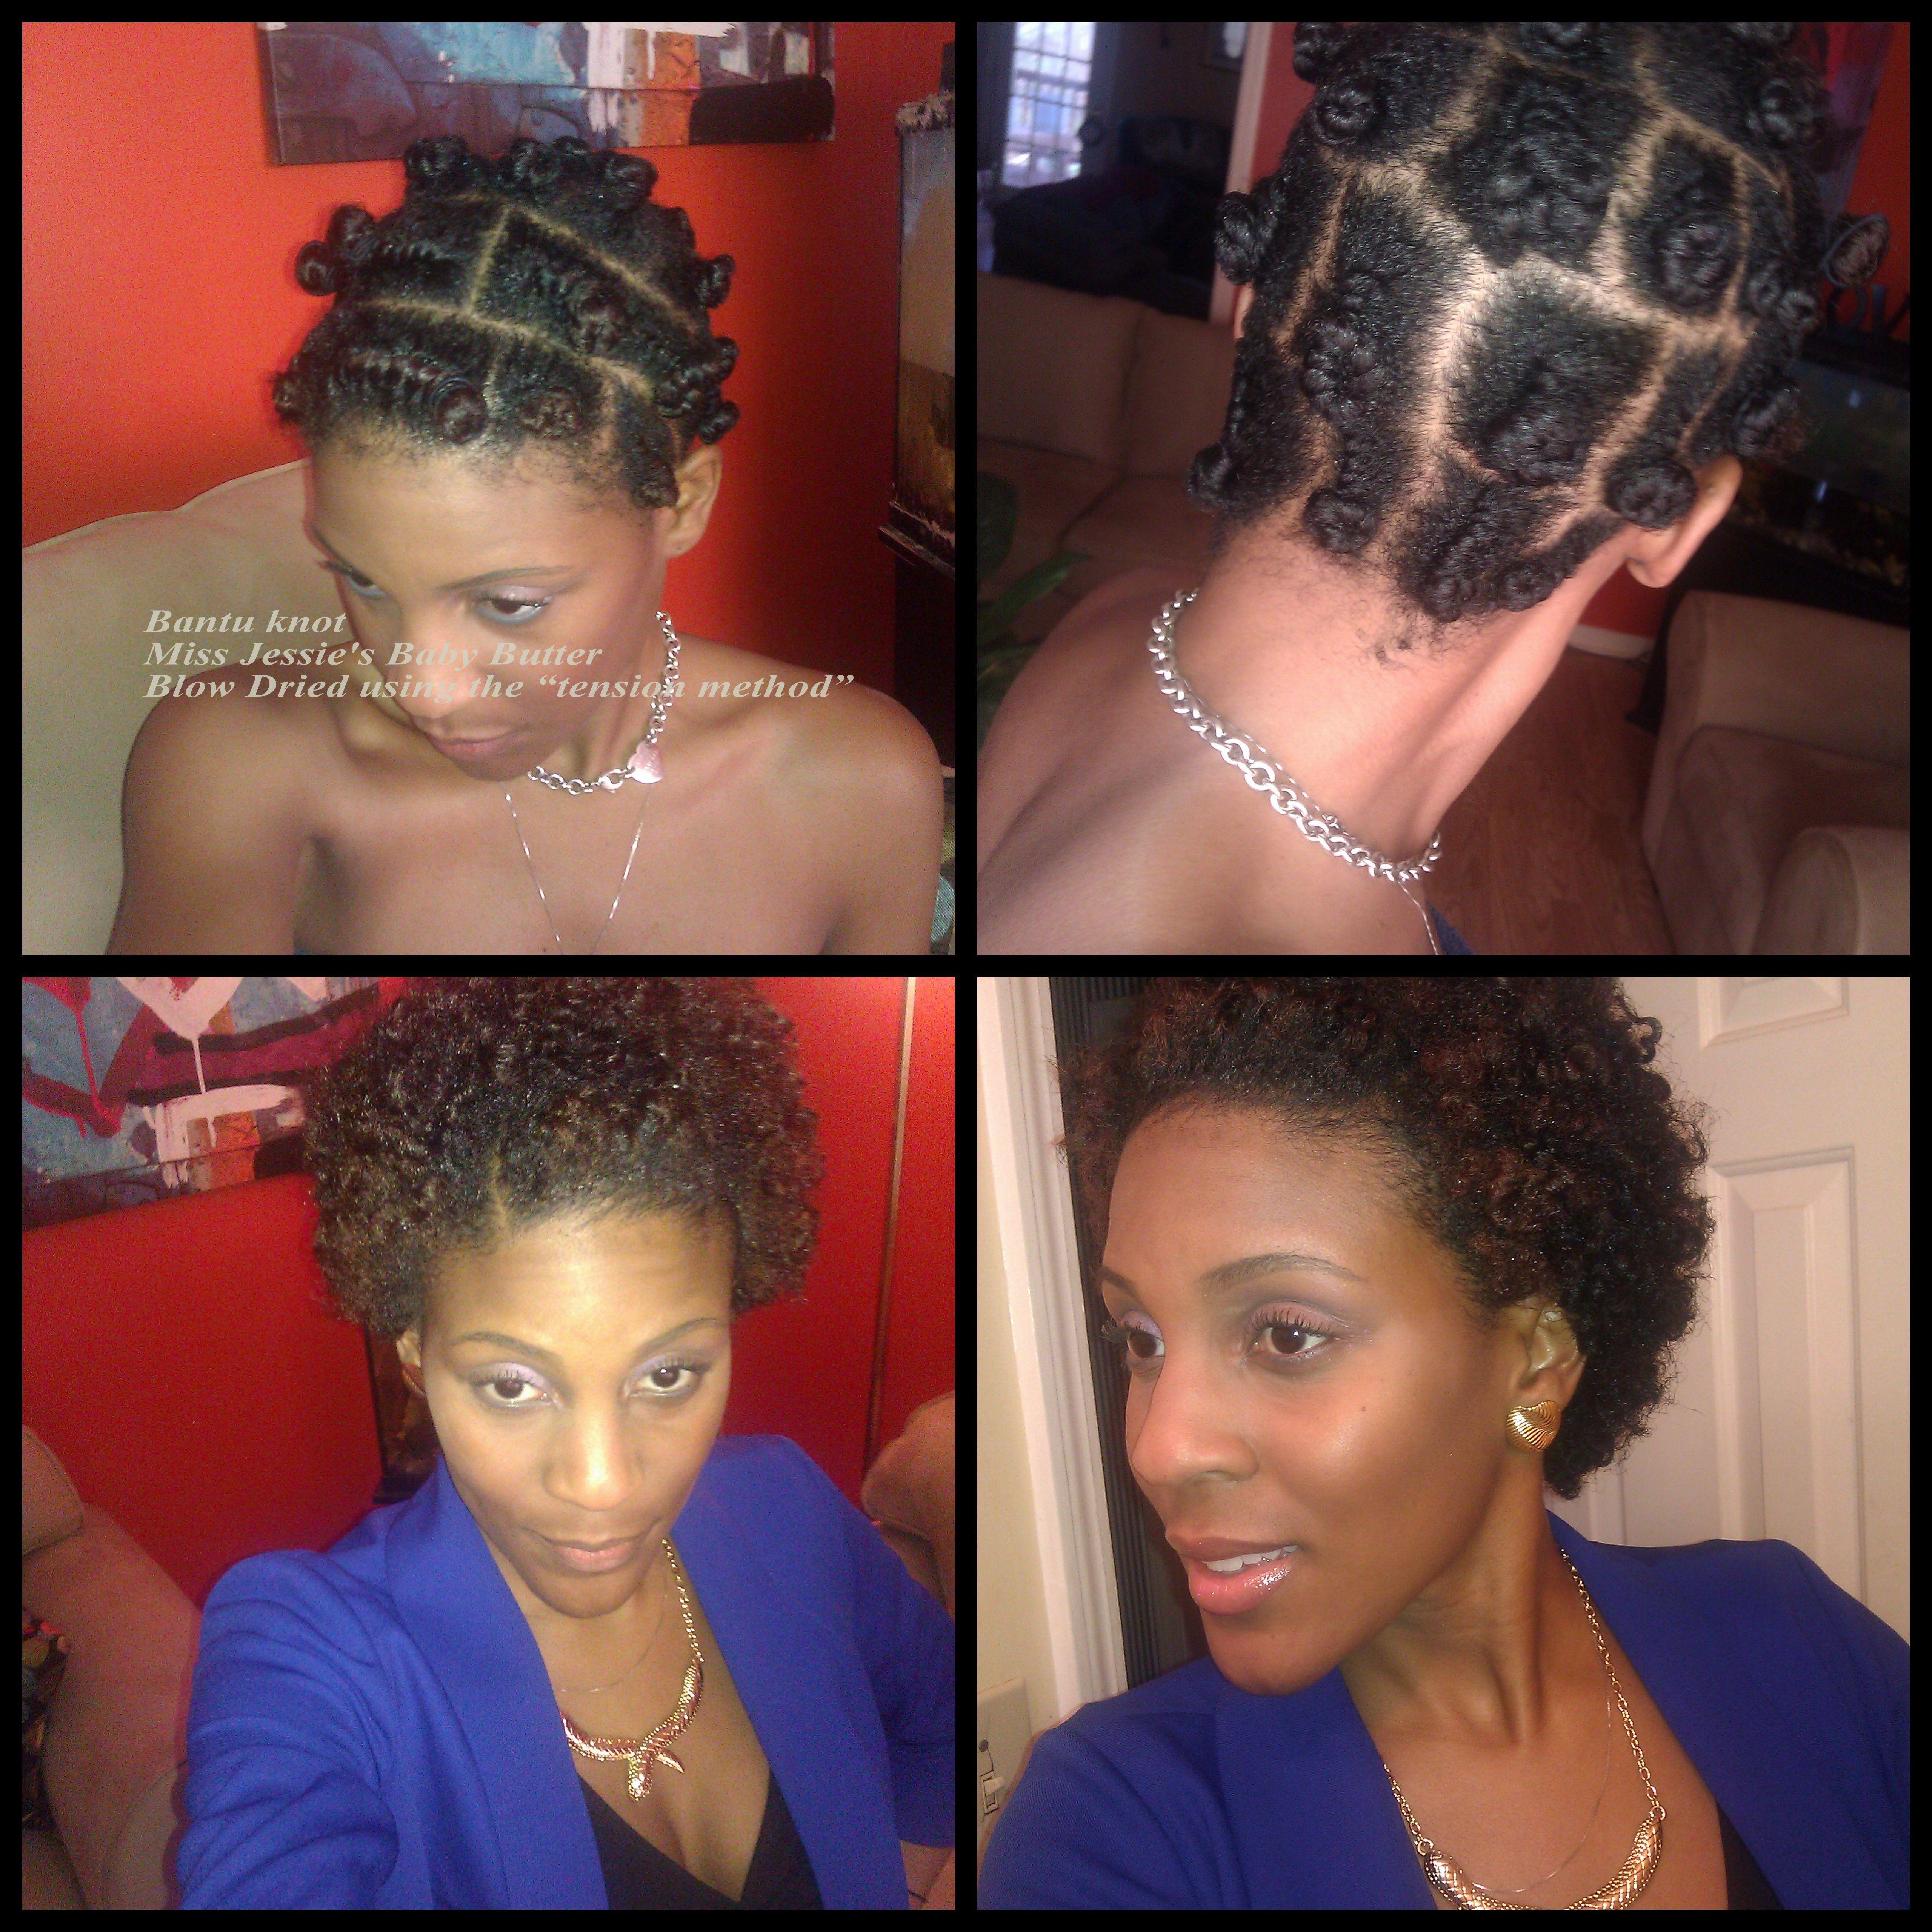 Short Natural Hair After Bantu Knot